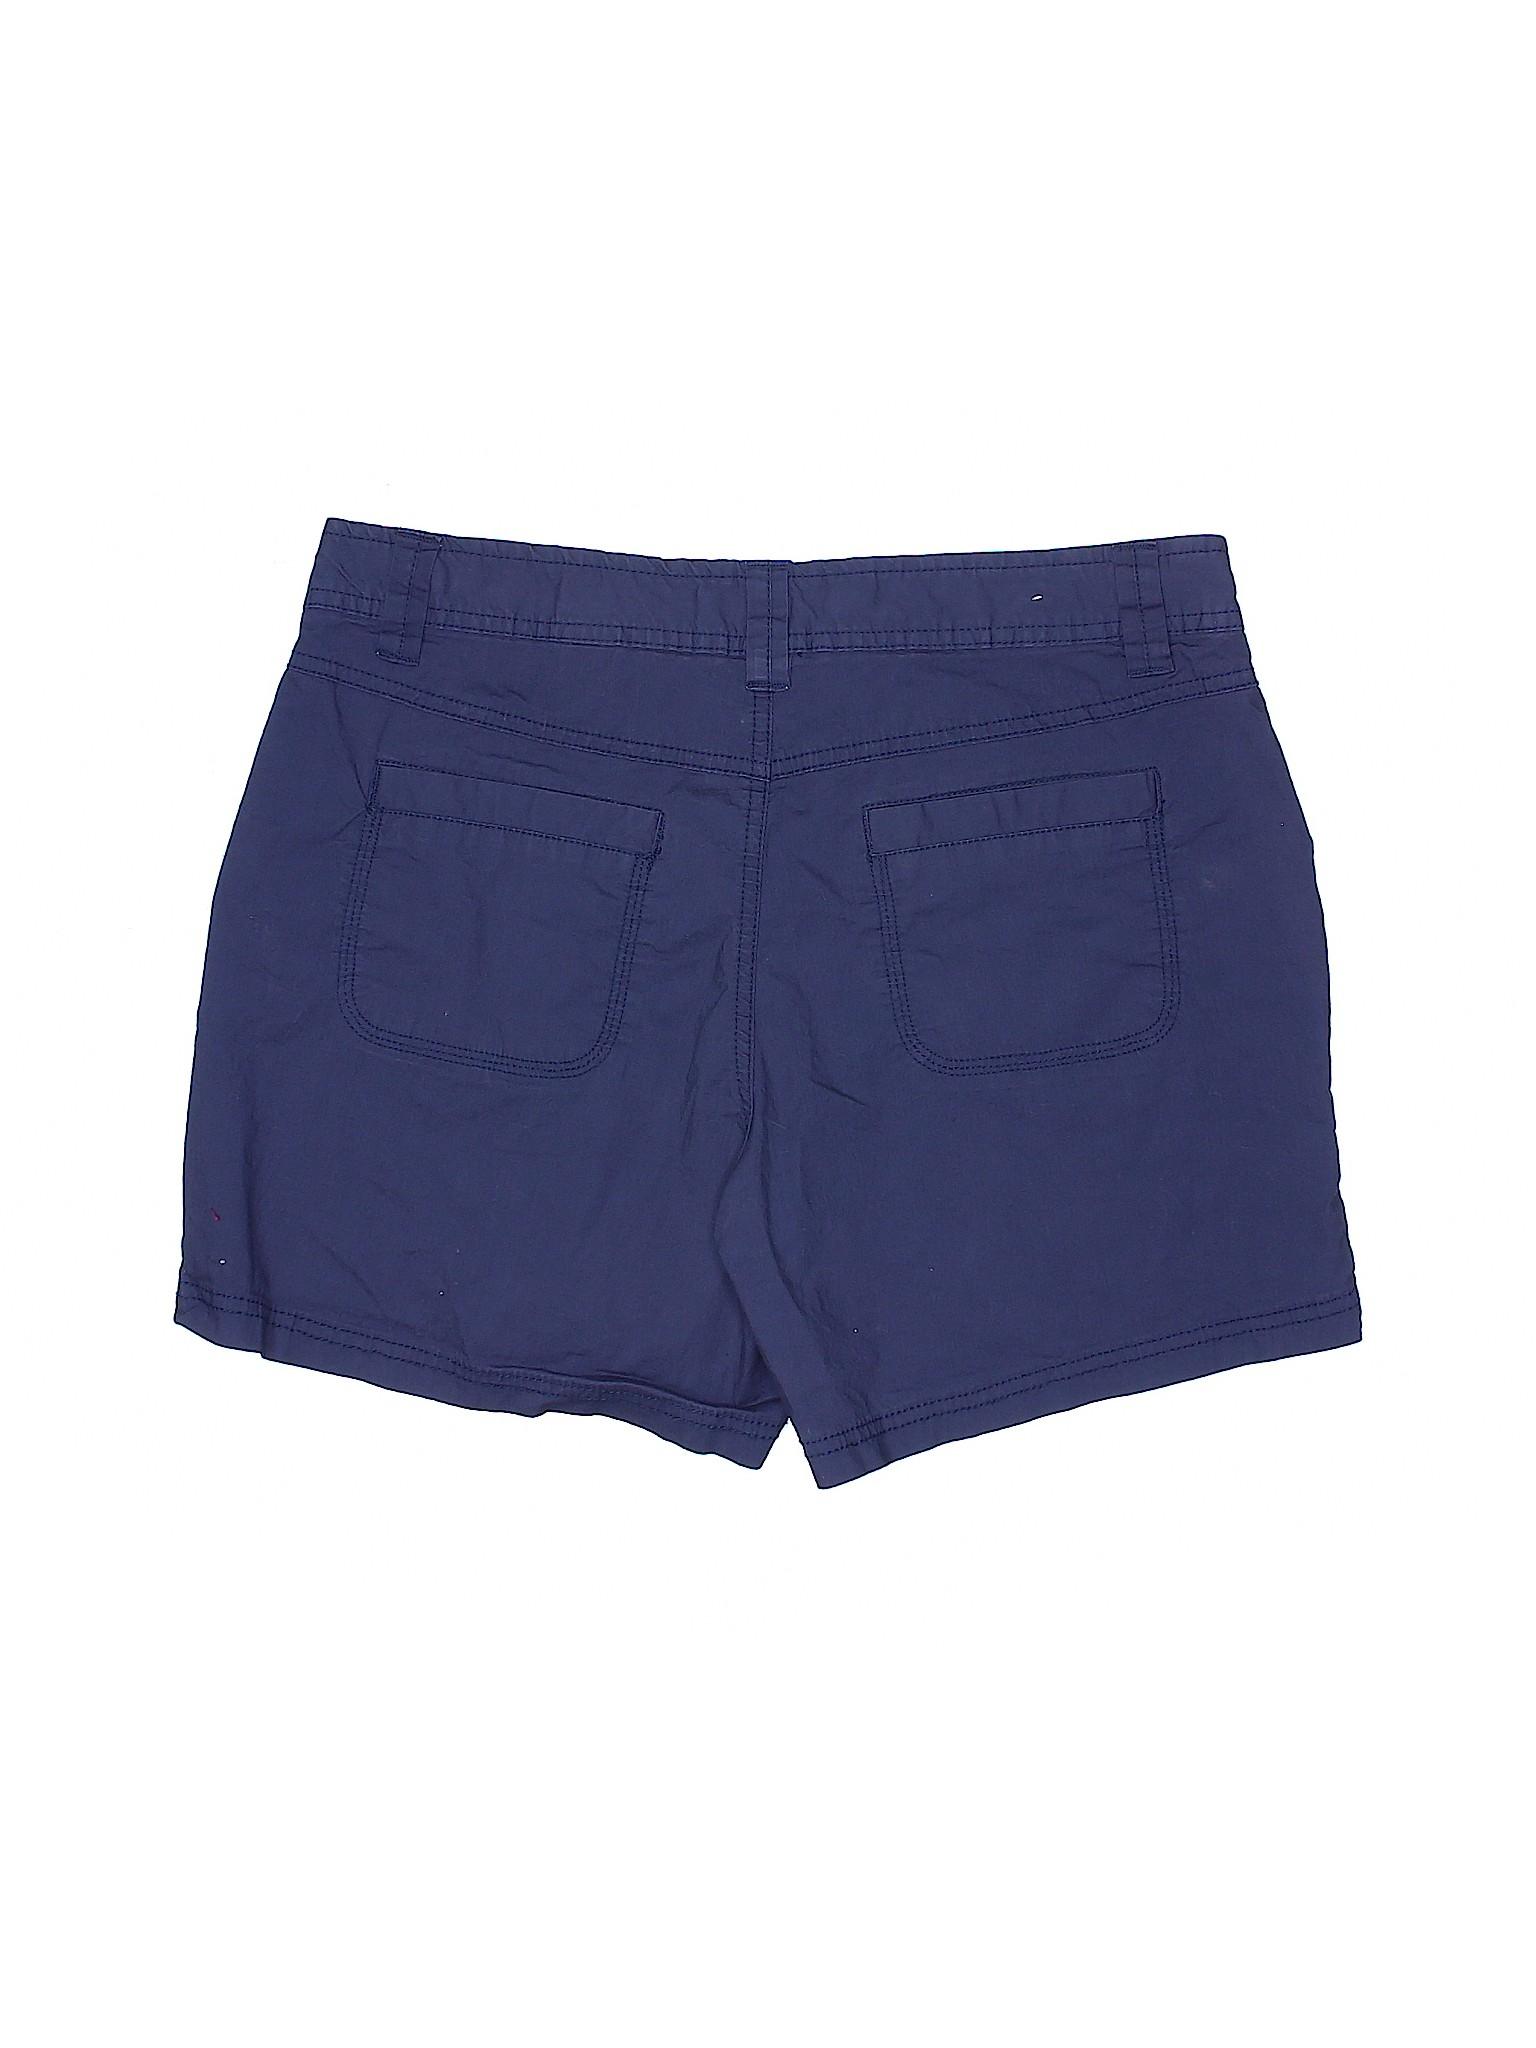 Jeans DKNY Boutique Shorts DKNY Khaki Jeans Shorts Boutique Khaki HwBq4OF